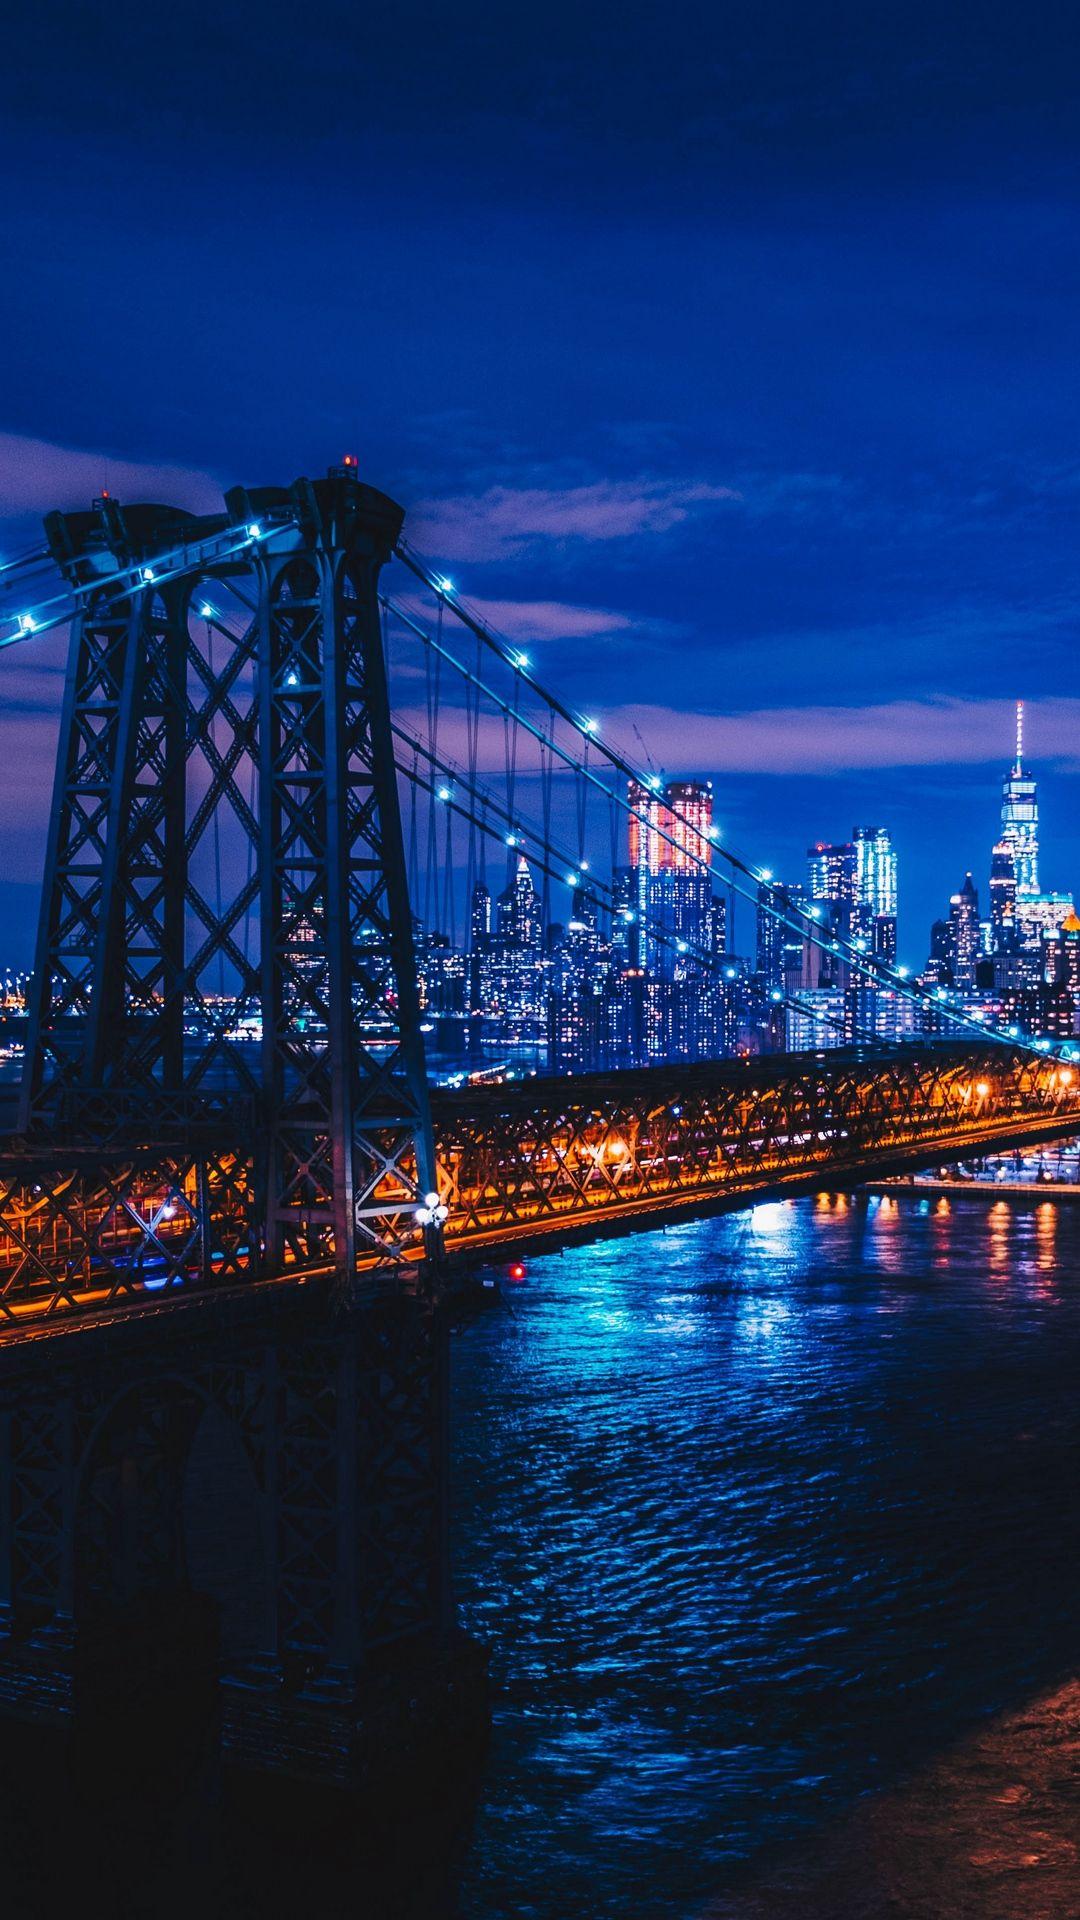 New York Night City Bridge Iphone 8 Wallpaper New York Wallpaper Night City New York Iphone Wallpaper